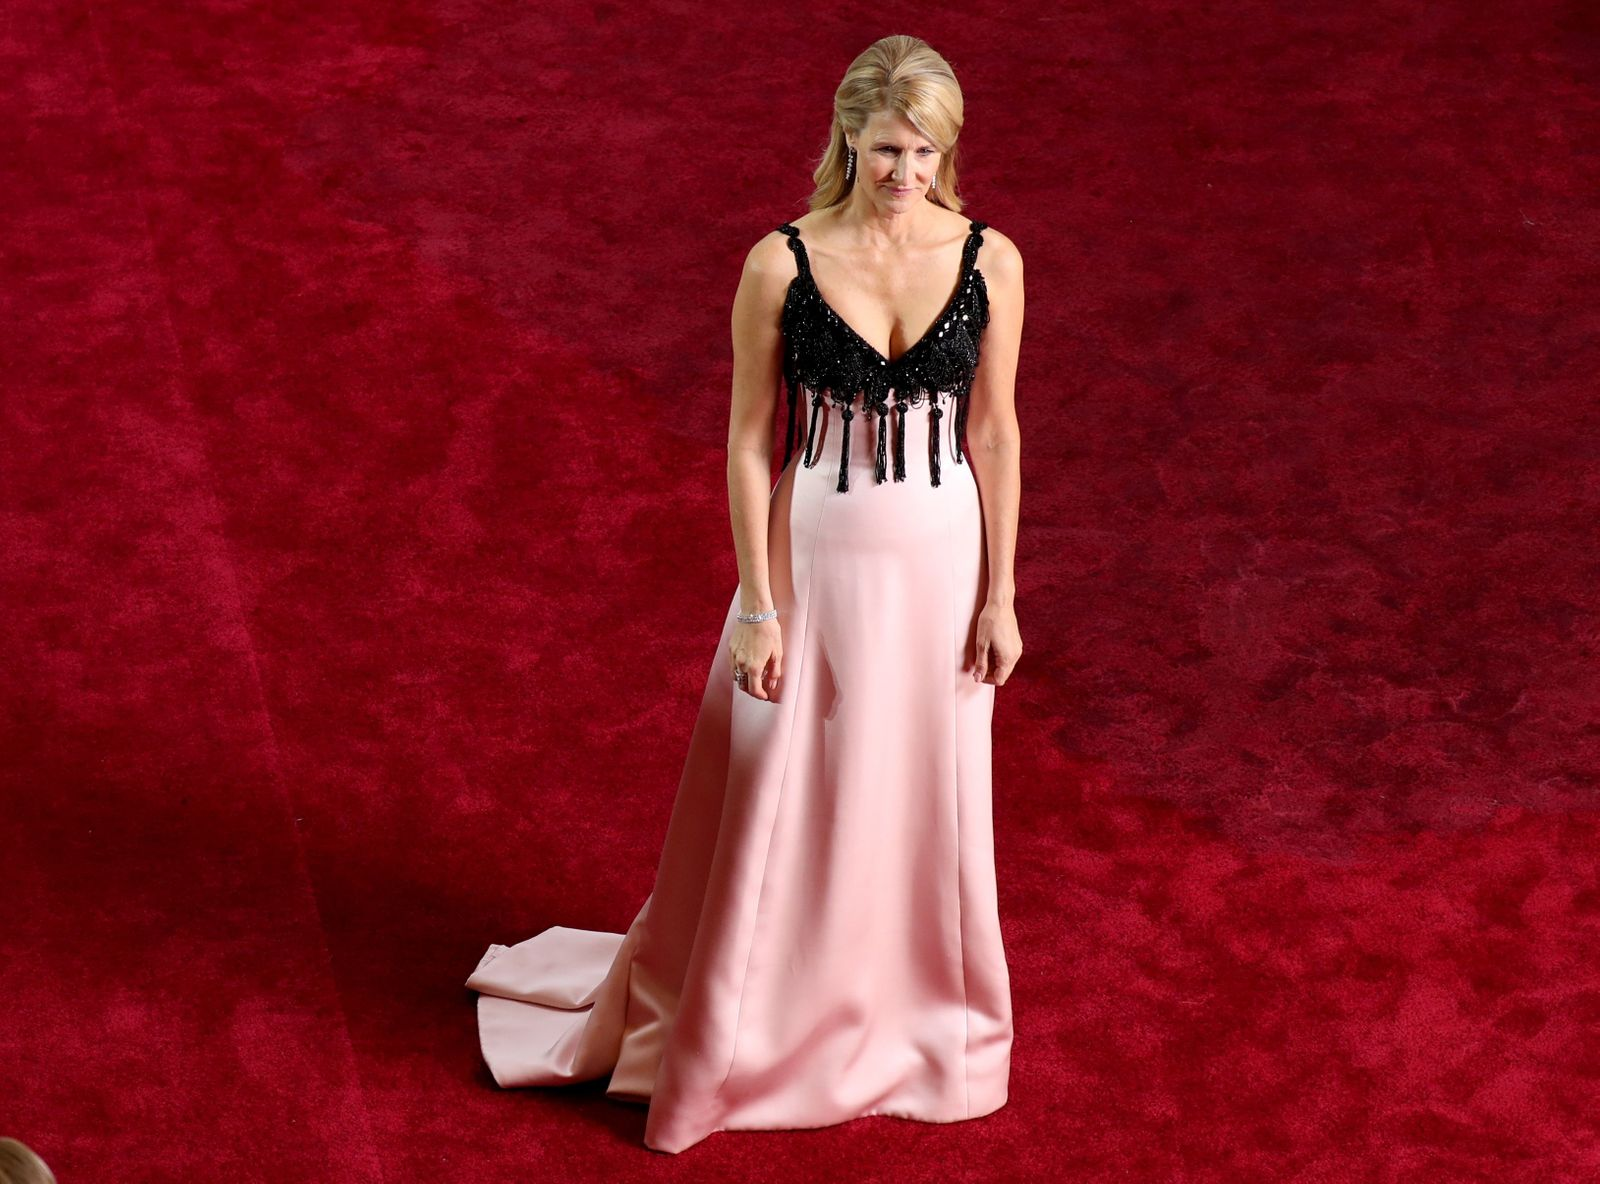 Arrivals - 92nd Academy Awards, Hollywood, USA - 28 Nov 2019